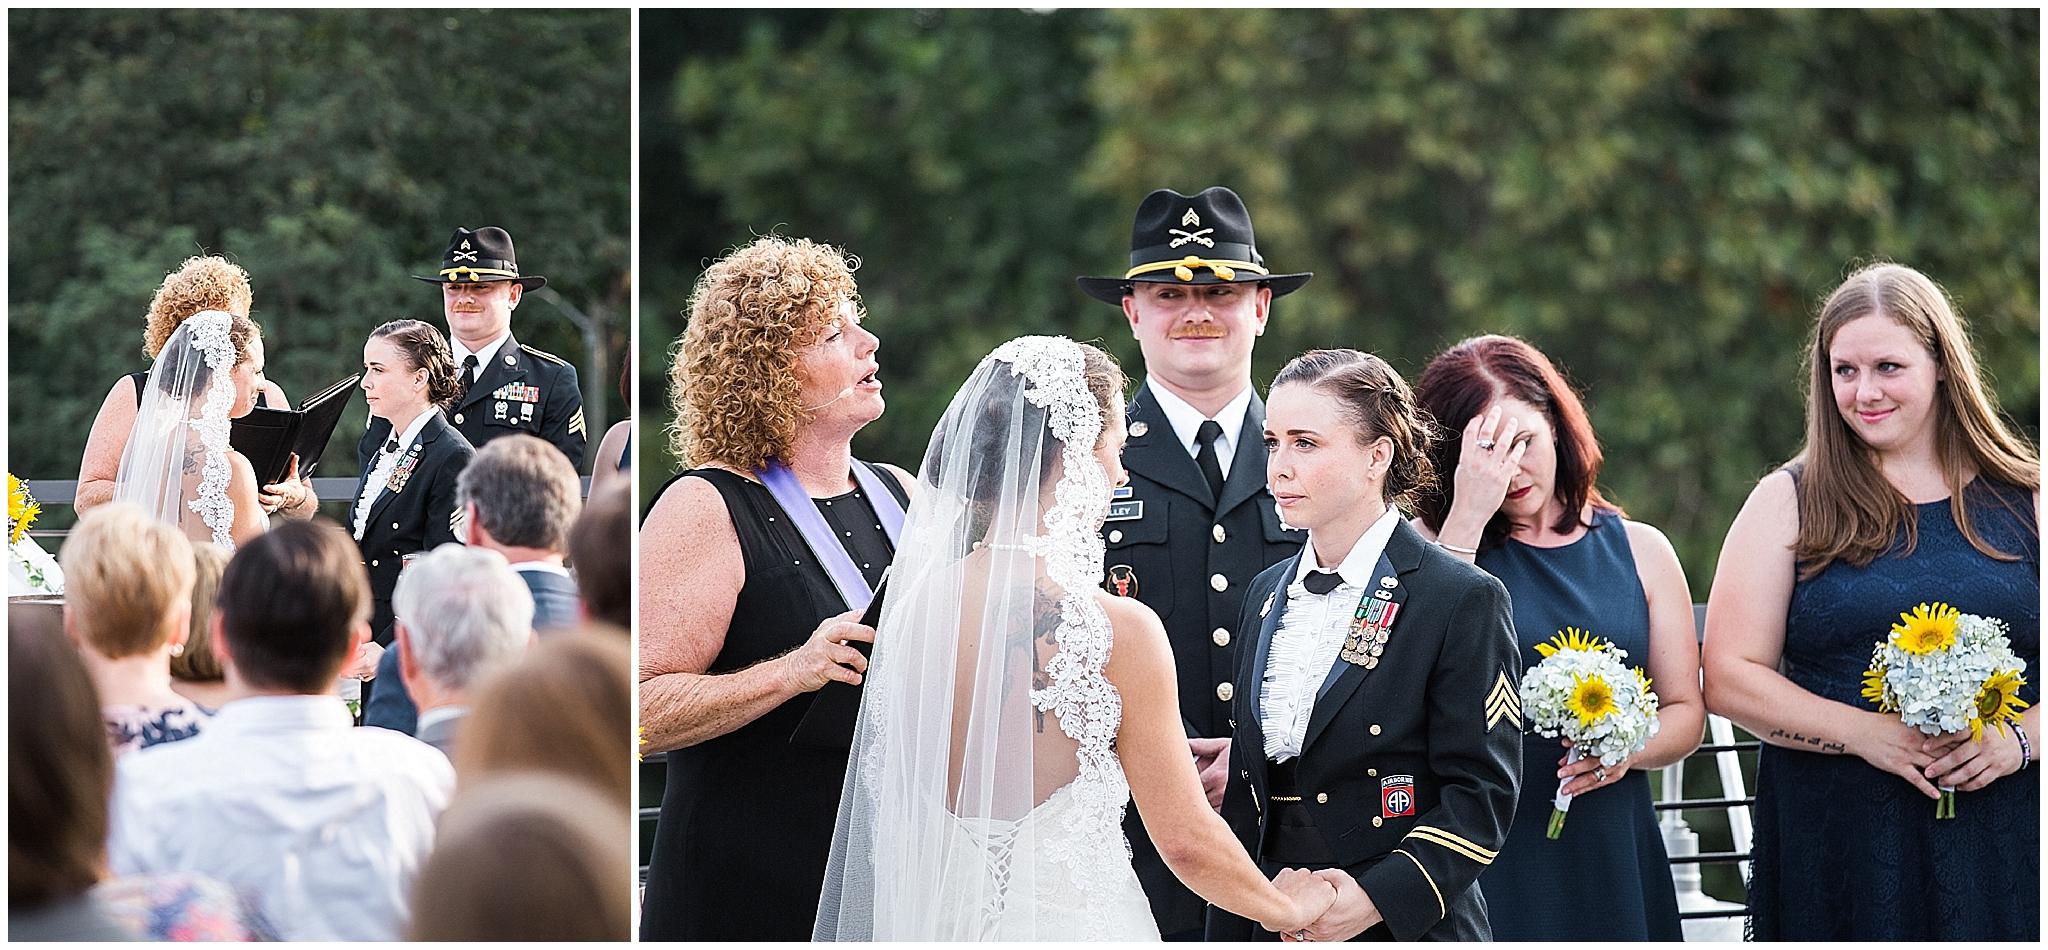 Wedding_Asheville_Highland_Brewing_Photographer_16.jpg